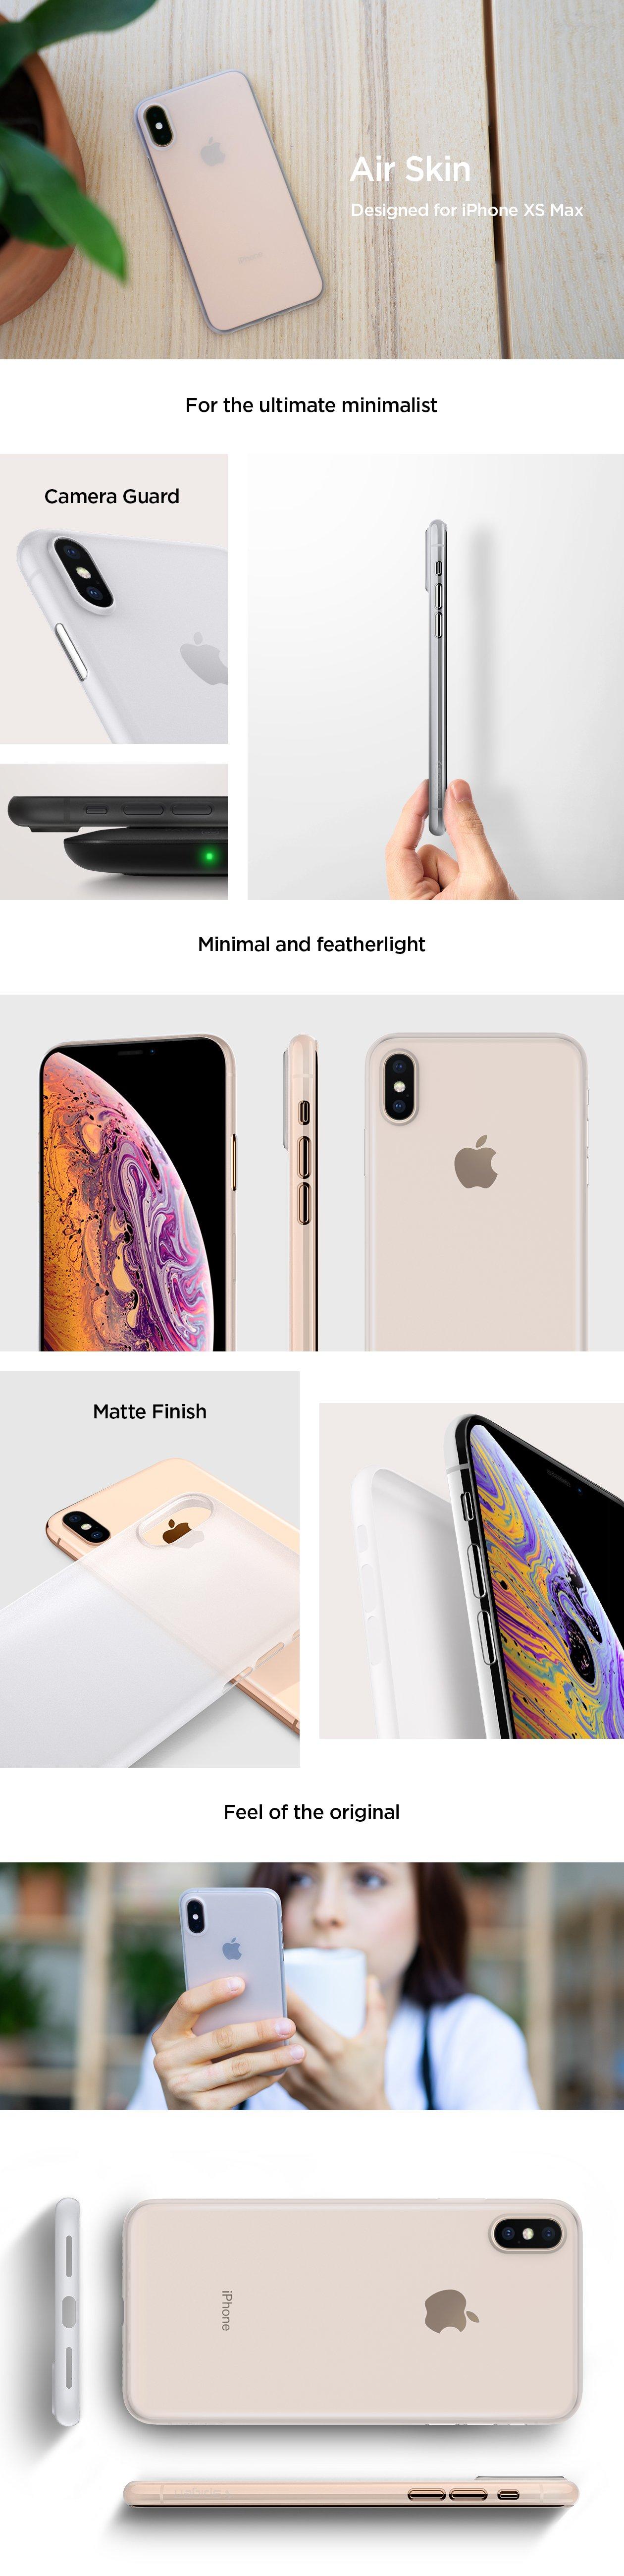 Obal, kryt, pouzdro Spigen Air Skin na Apple iPhone XS MAX